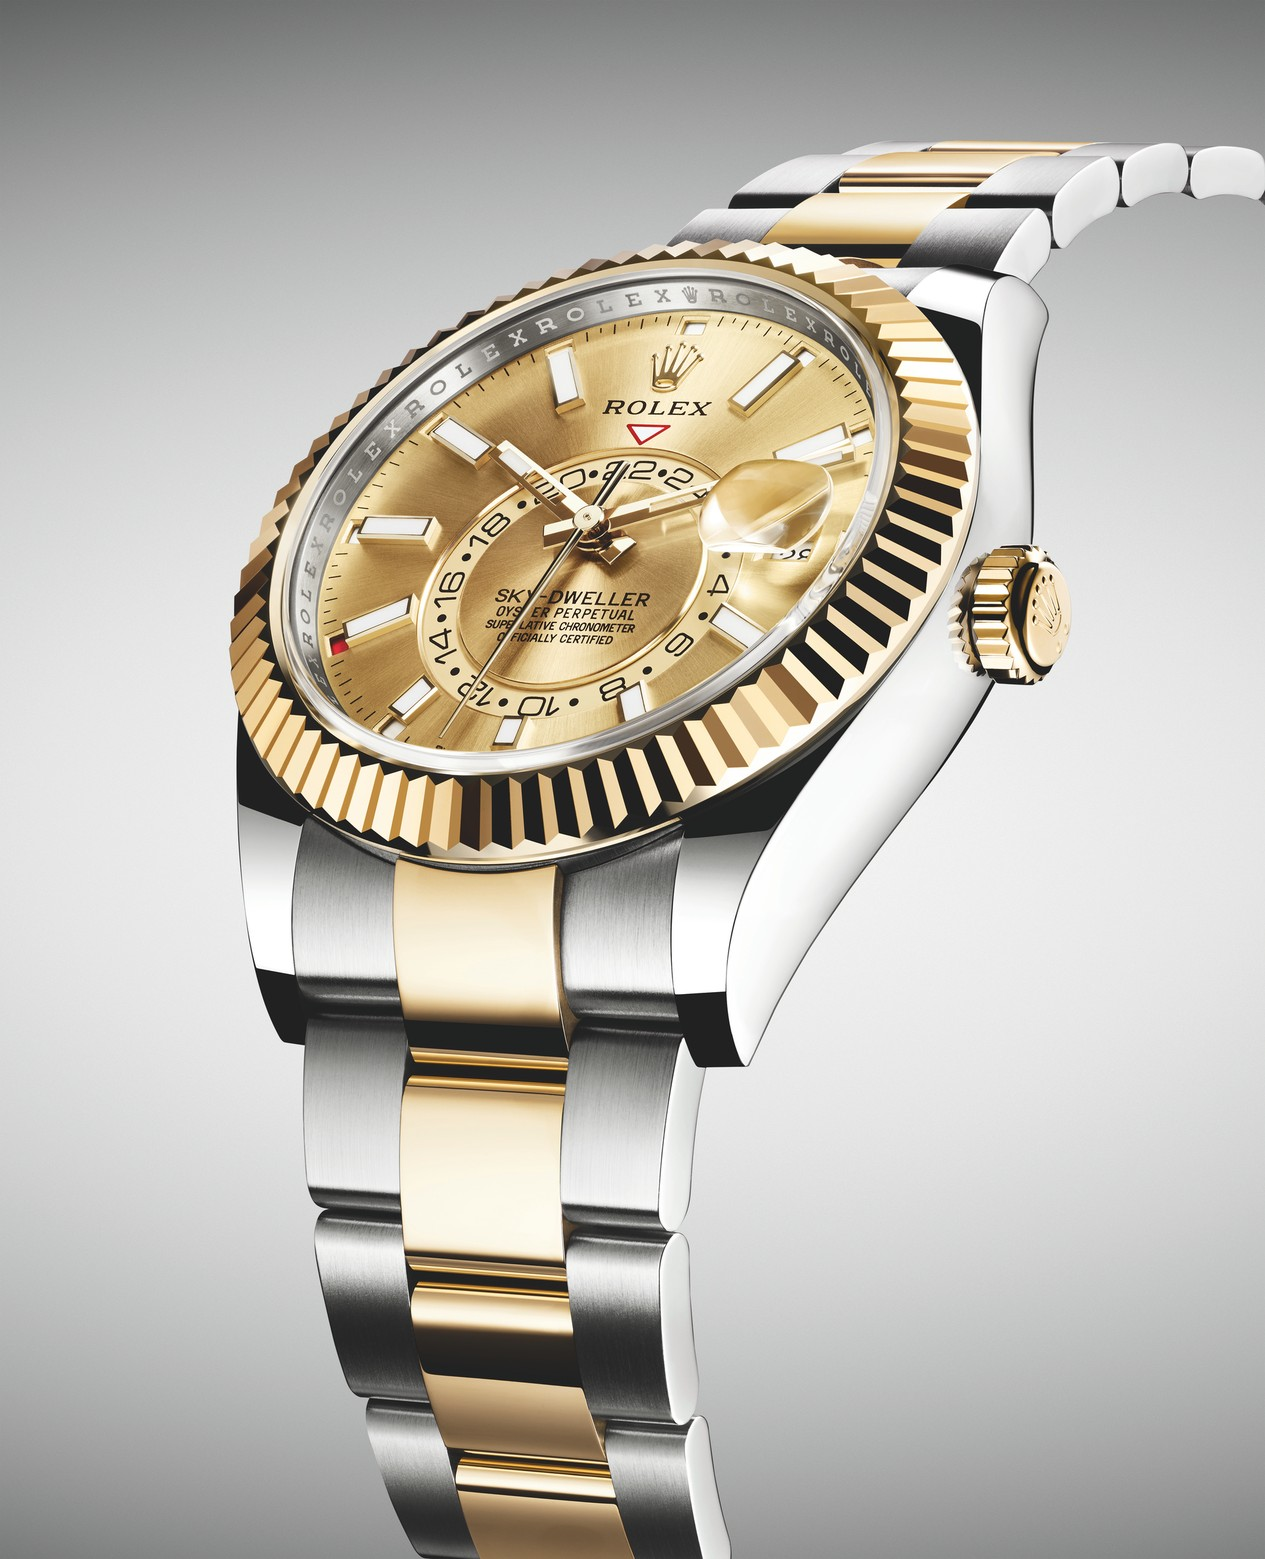 Rolex Sky-Dweller Ref. 326933, (c) Rolex